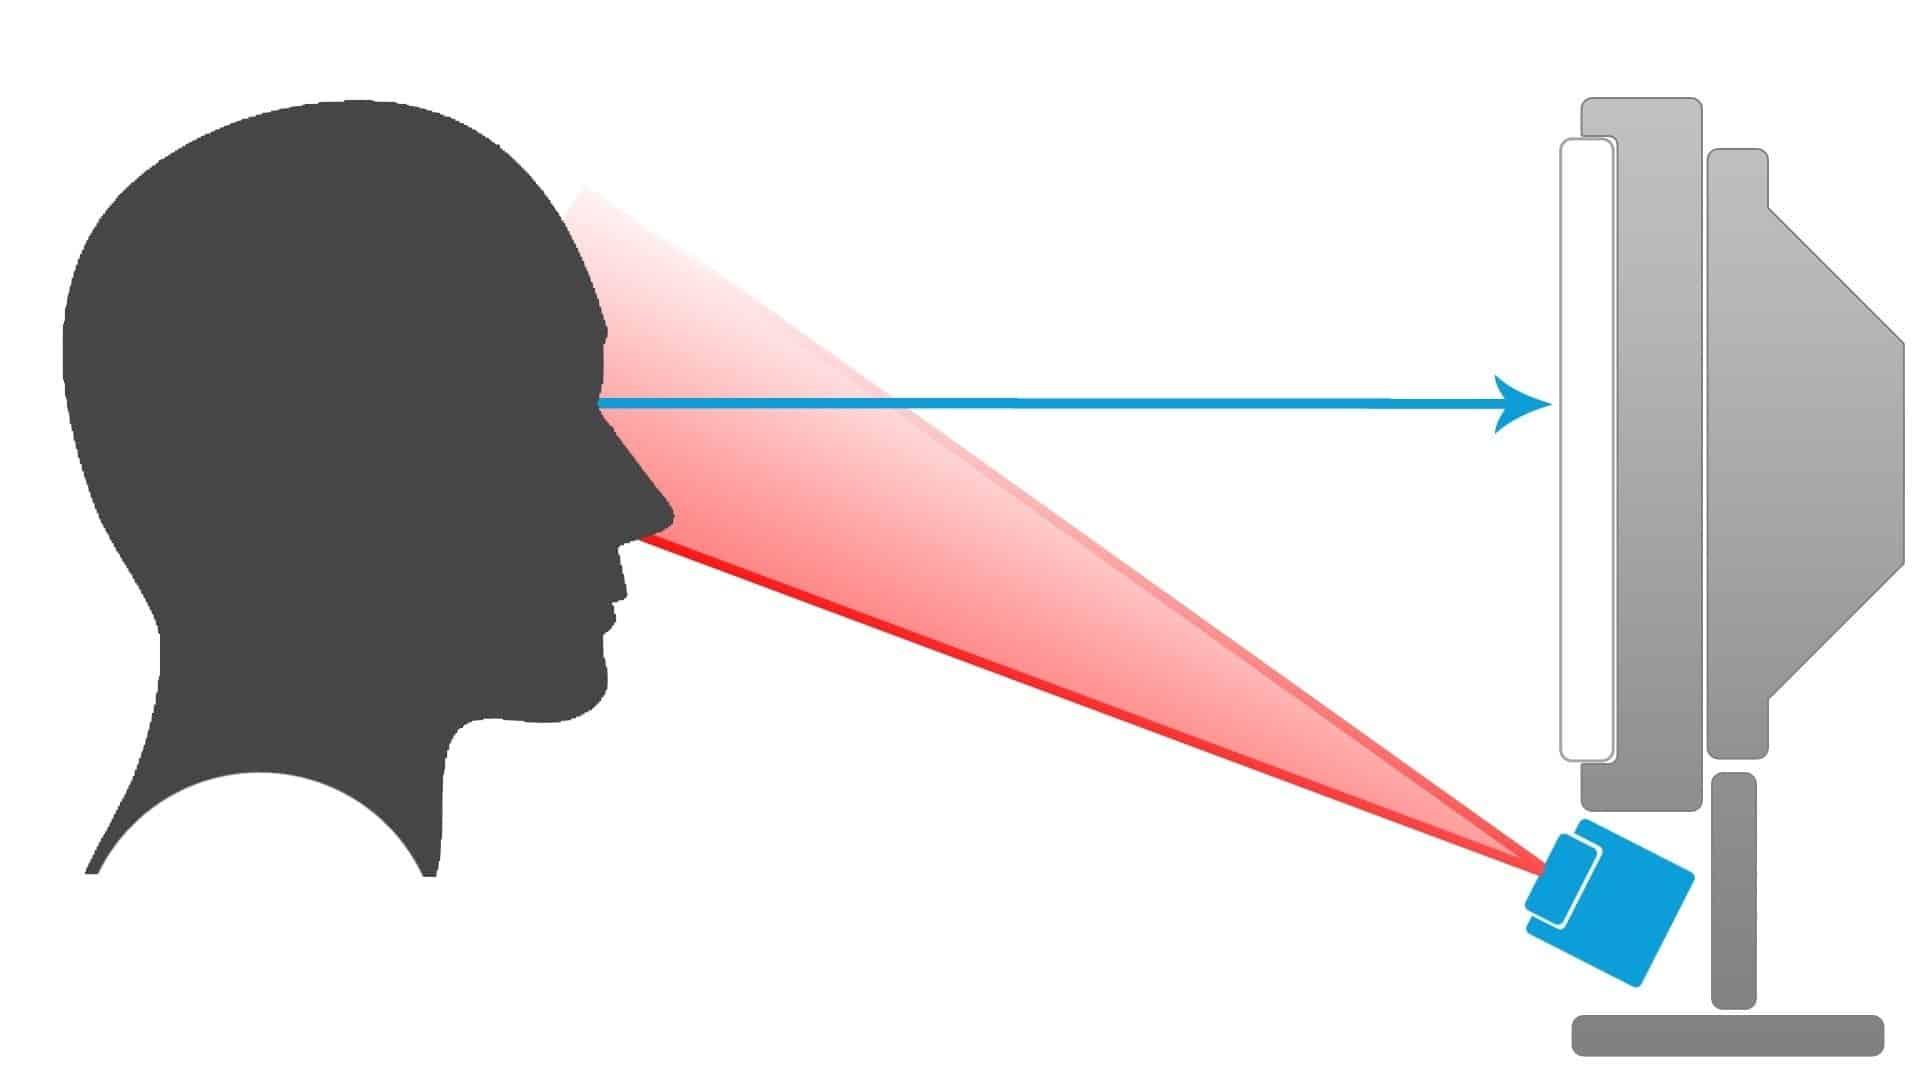 Puntatore ocularee - 4U > Lab - Laboratorio di tecnologie assistive